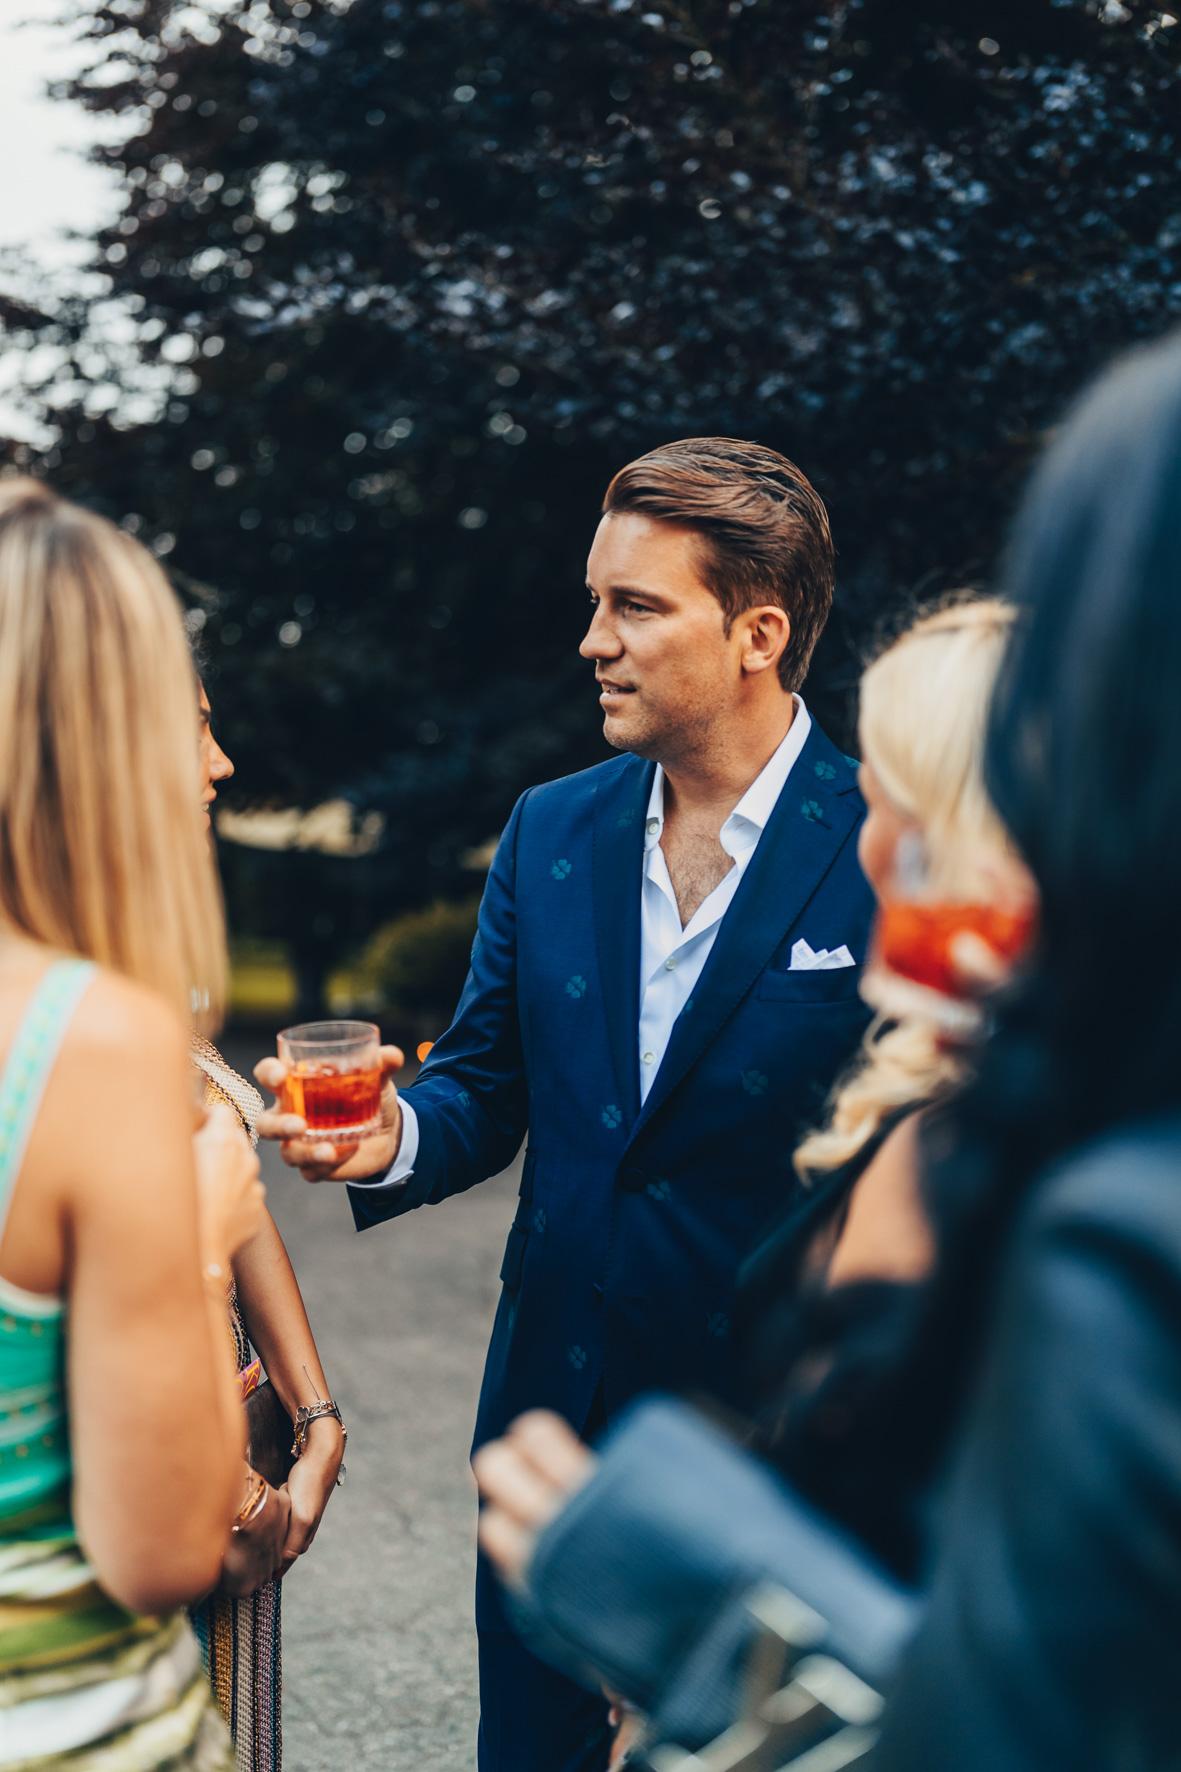 Konrad-lifestyle-art-basel-%22gold-member-experience%22-2019-68.jpg